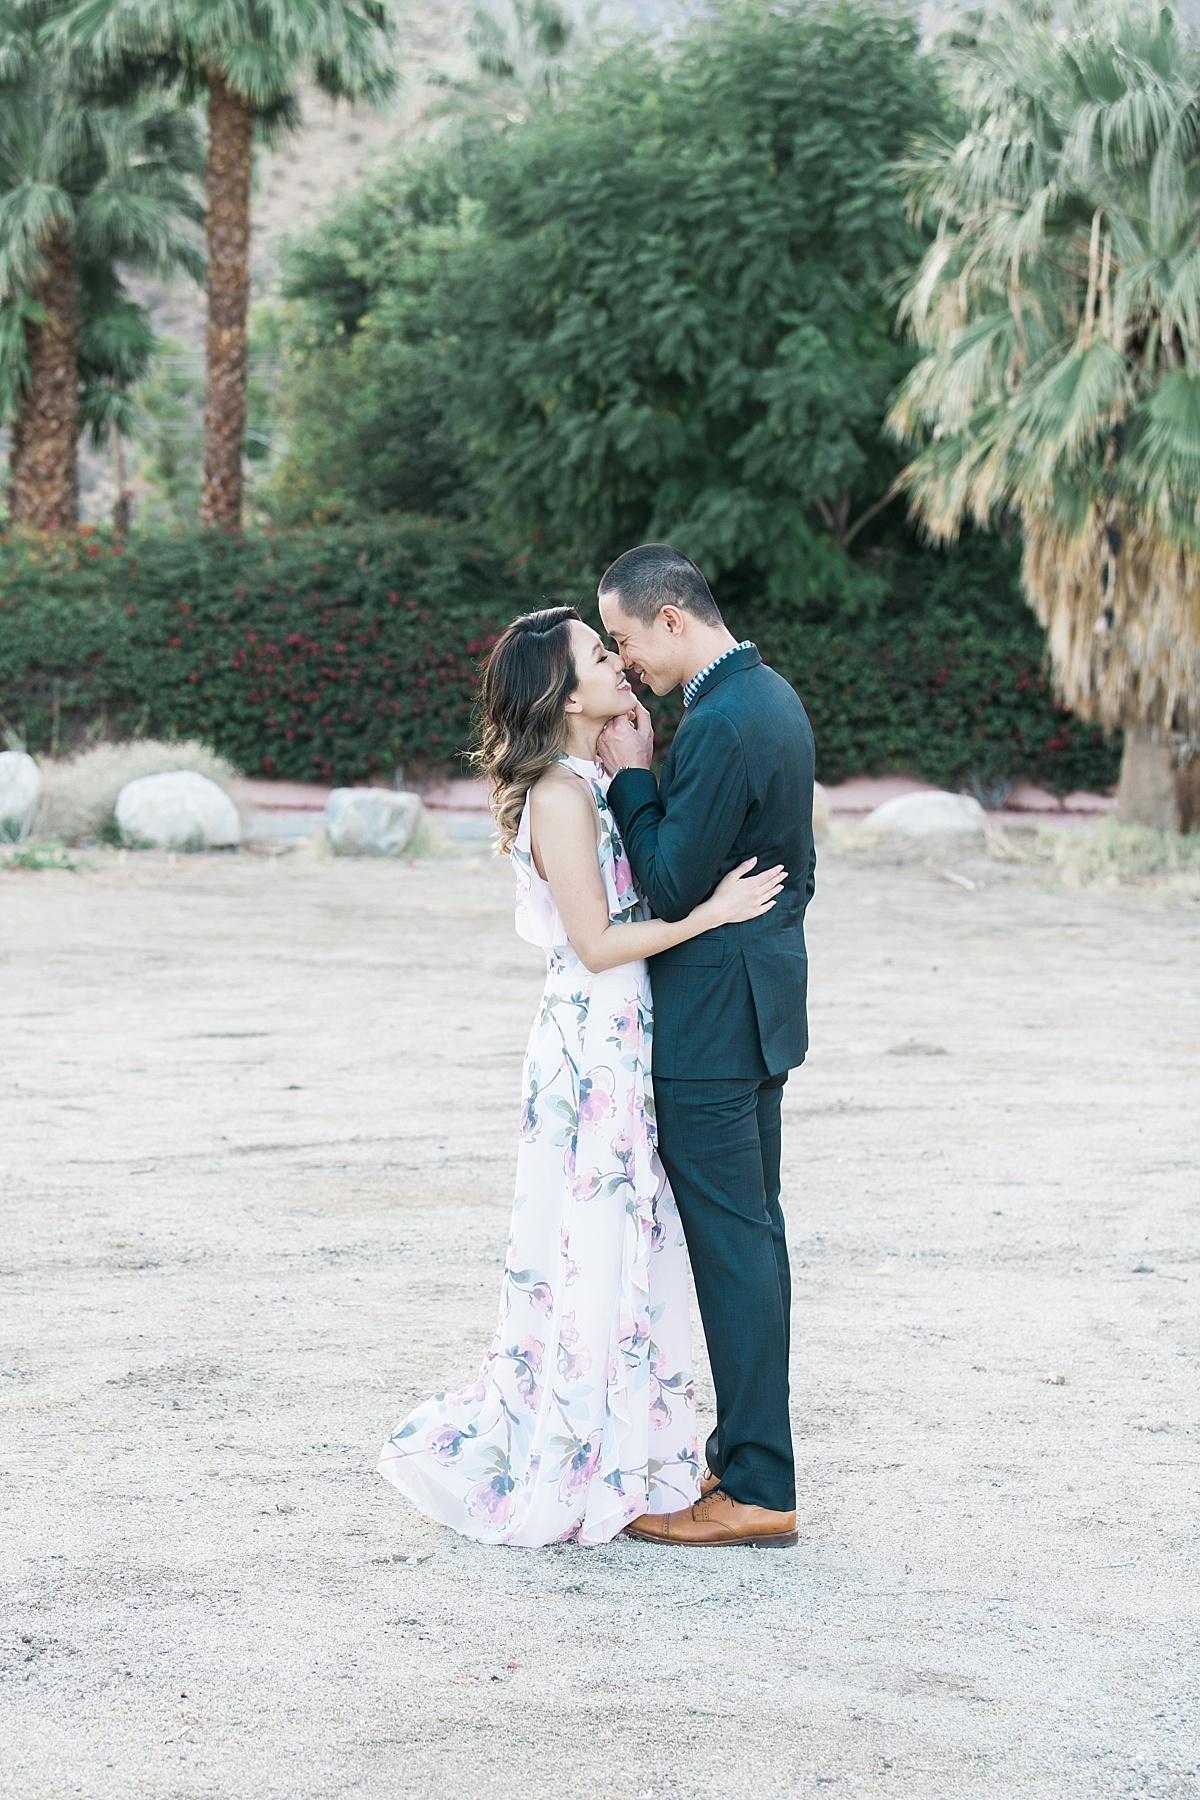 Palm-Springs-Engagement-Photographer-Tiff-Kenny-Carissa-Woo-Photography_0028.jpg